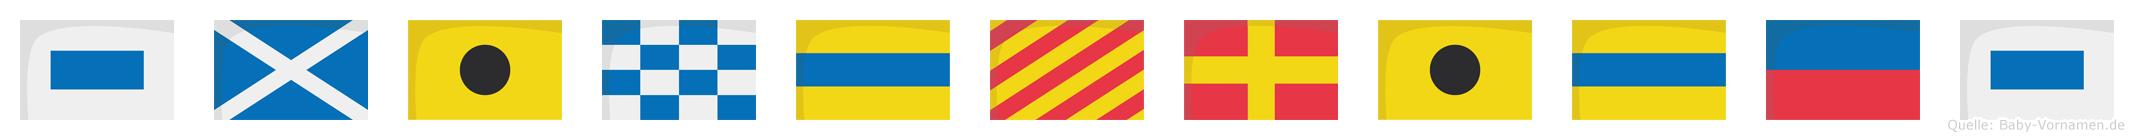 Smindyrides im Flaggenalphabet